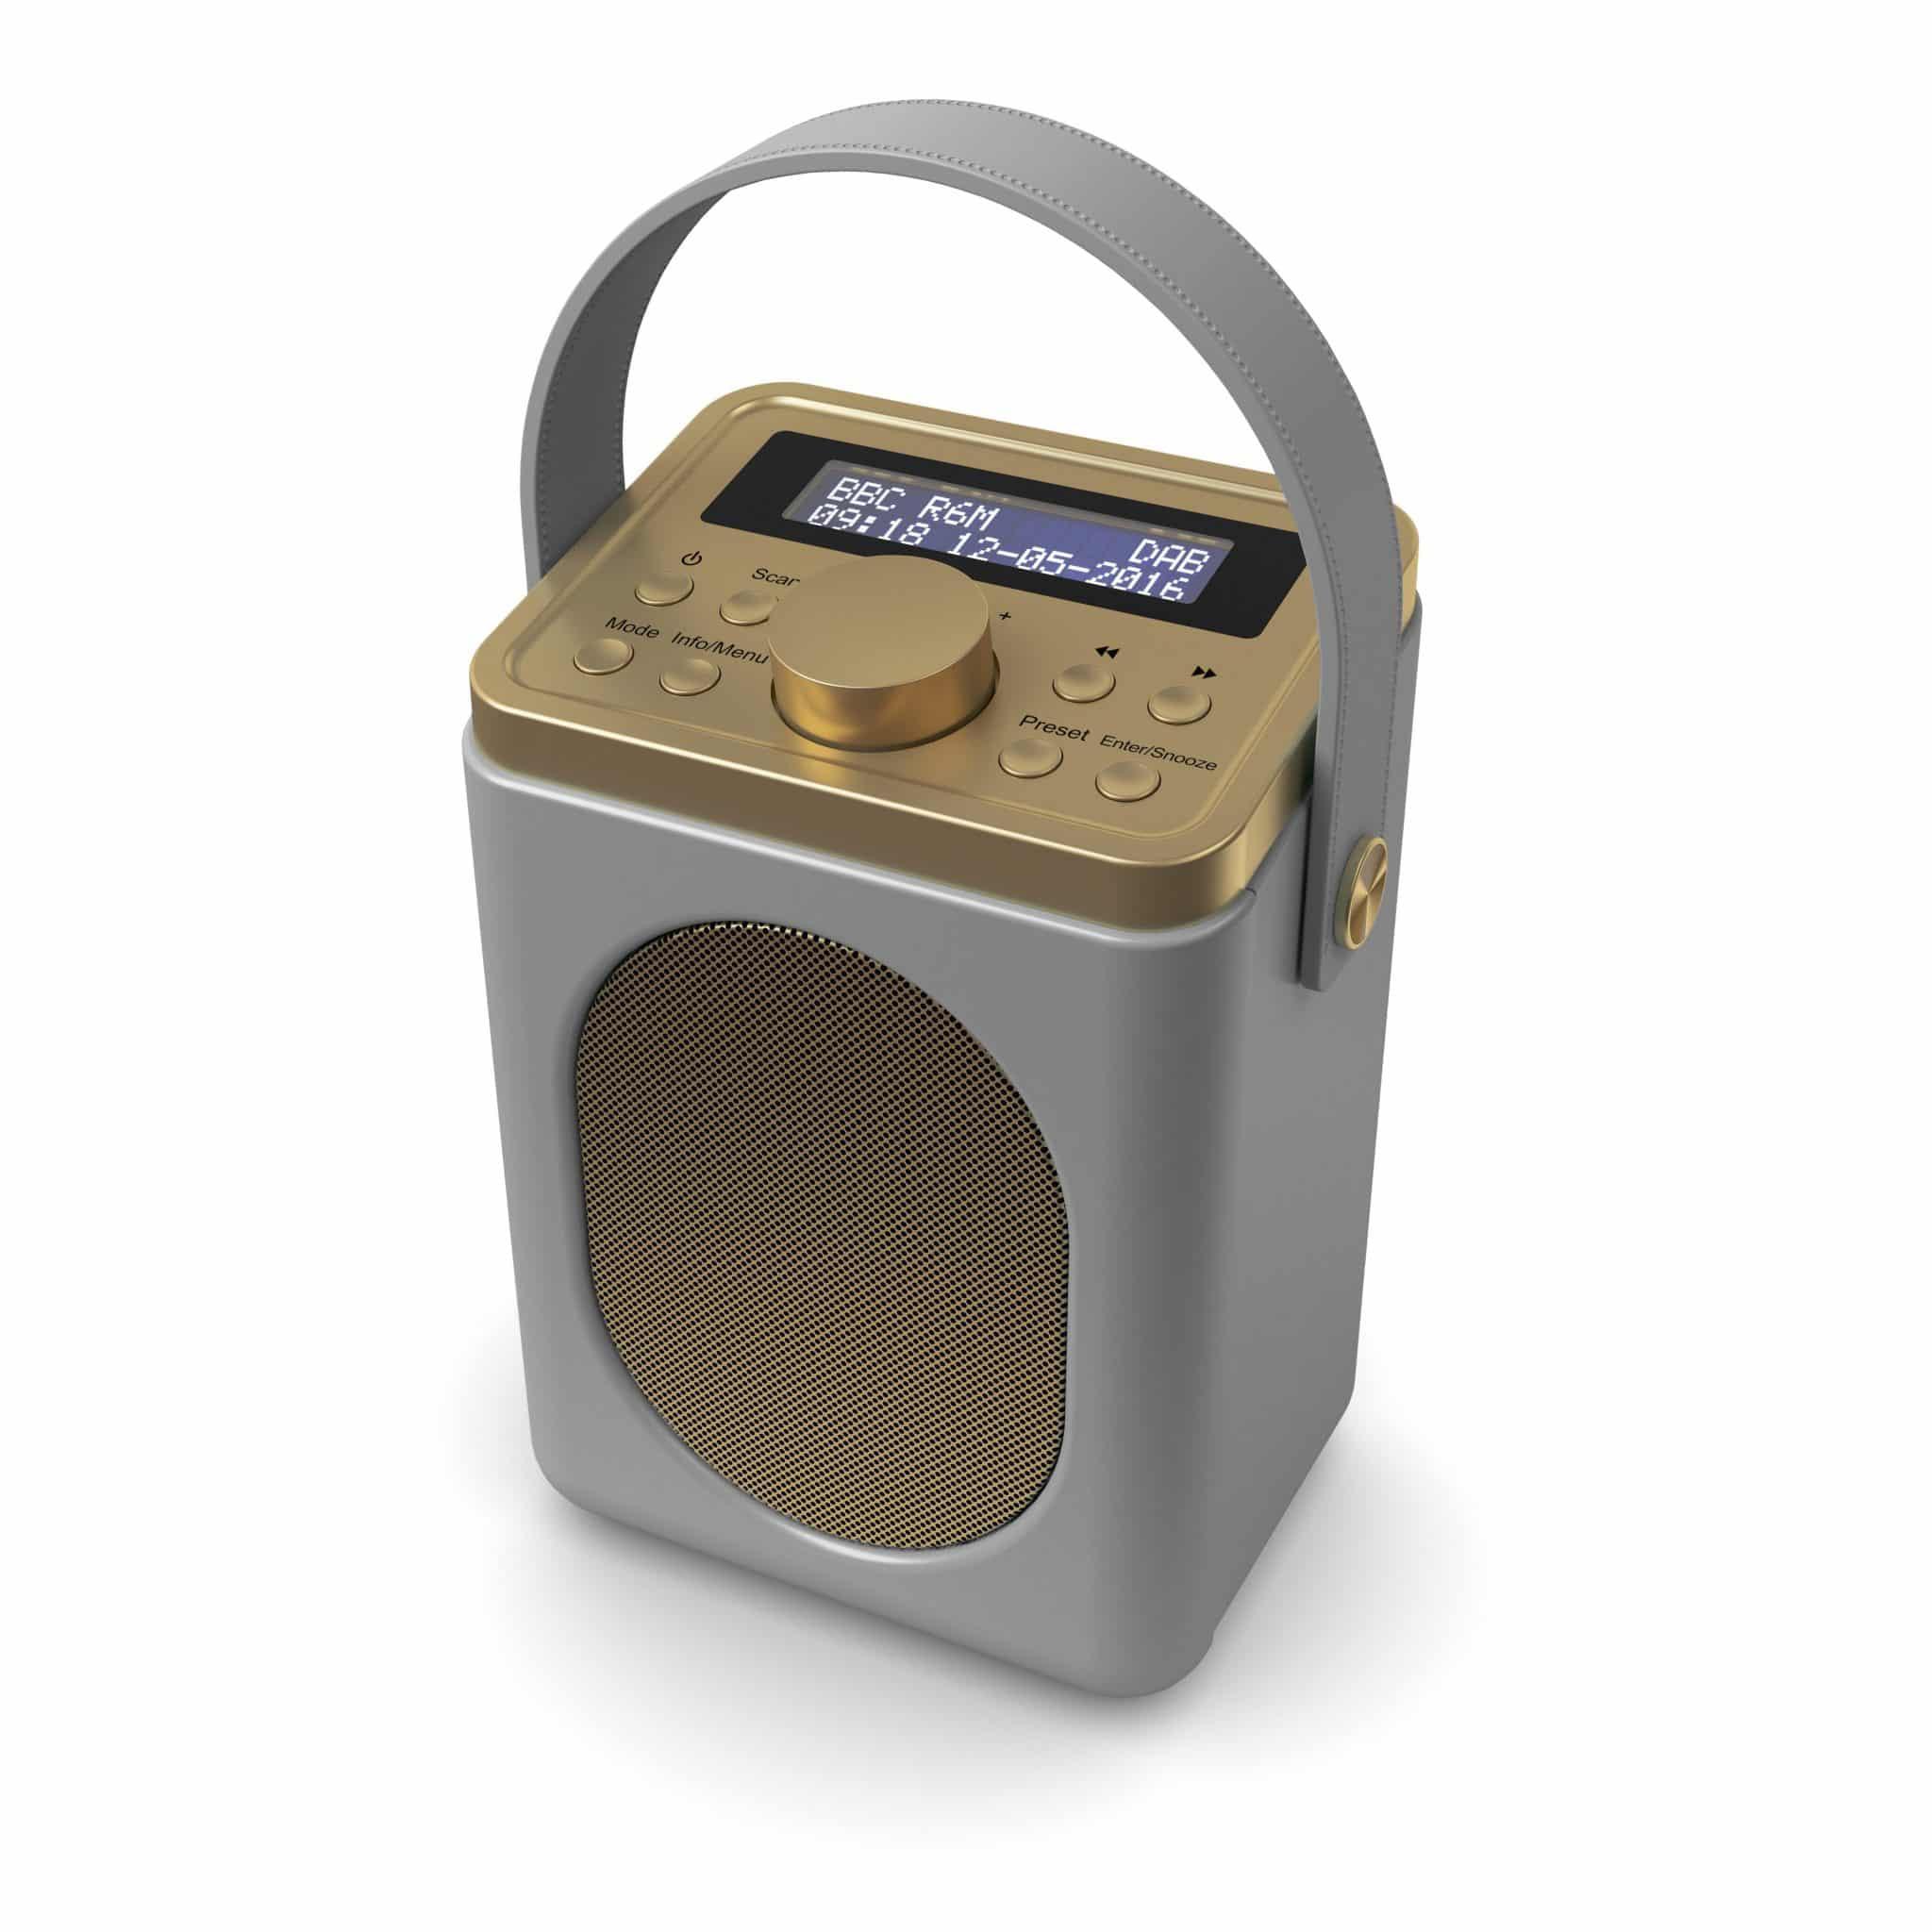 DAB Radio with Bluetooth - Little Shelford Grey Angled